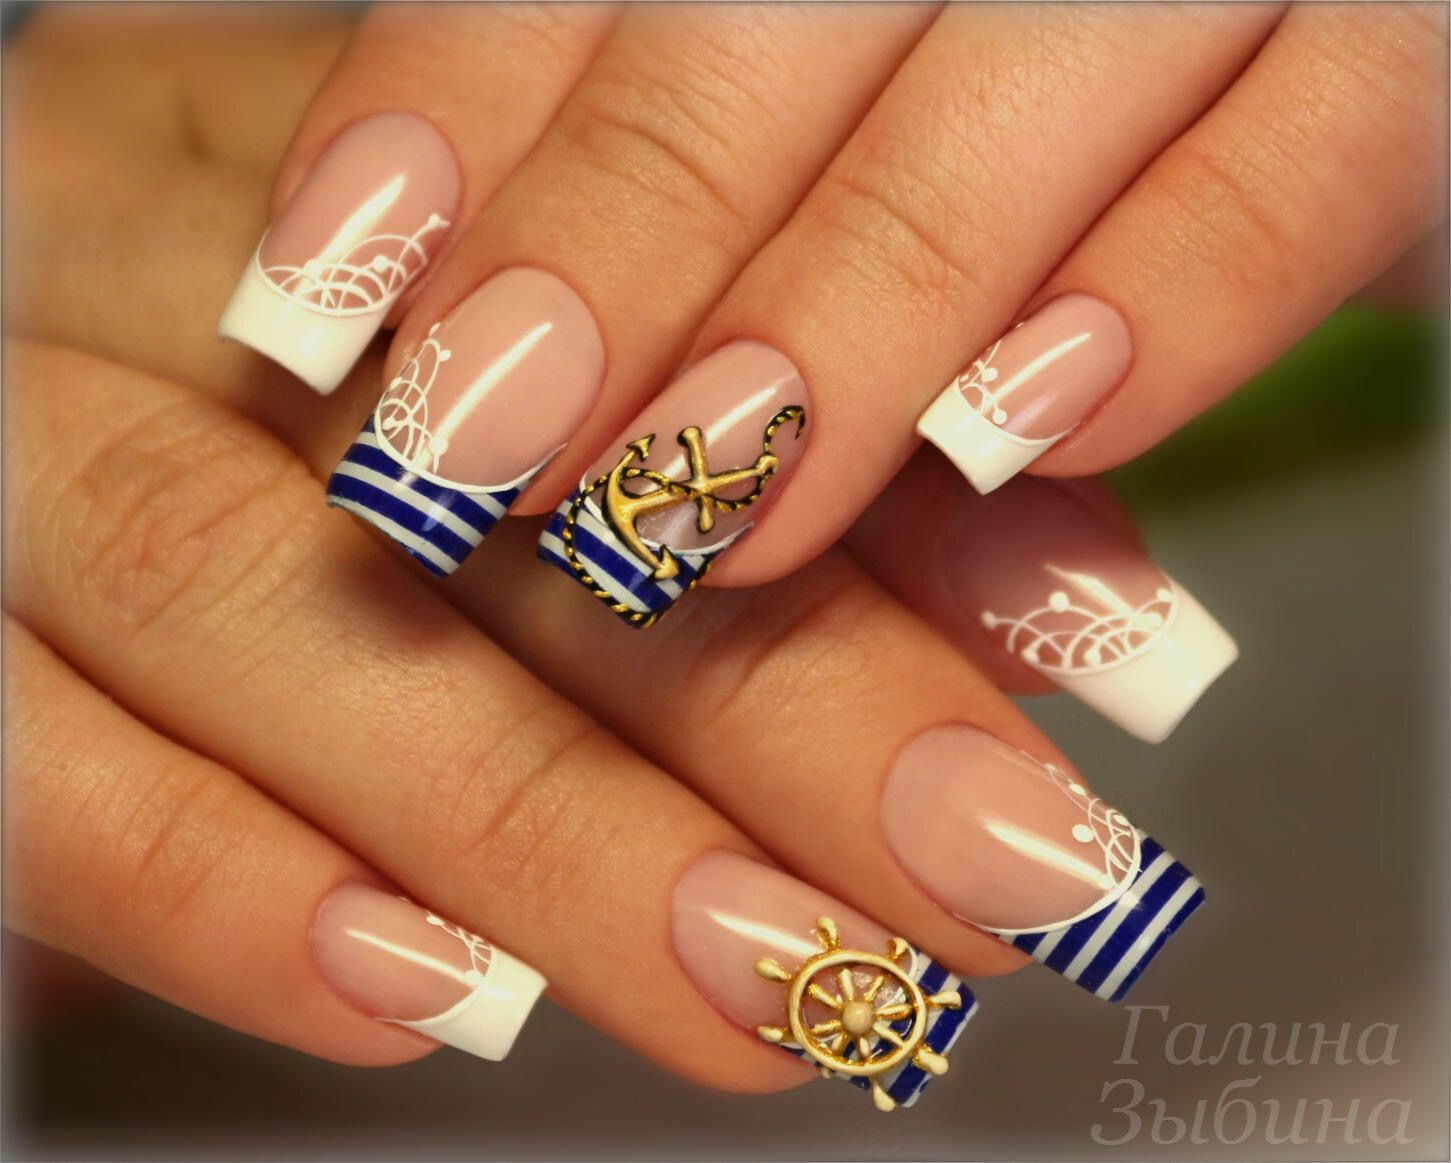 Pelikh nail ideas pinterest sailor nails pelikh nail ideas prinsesfo Images